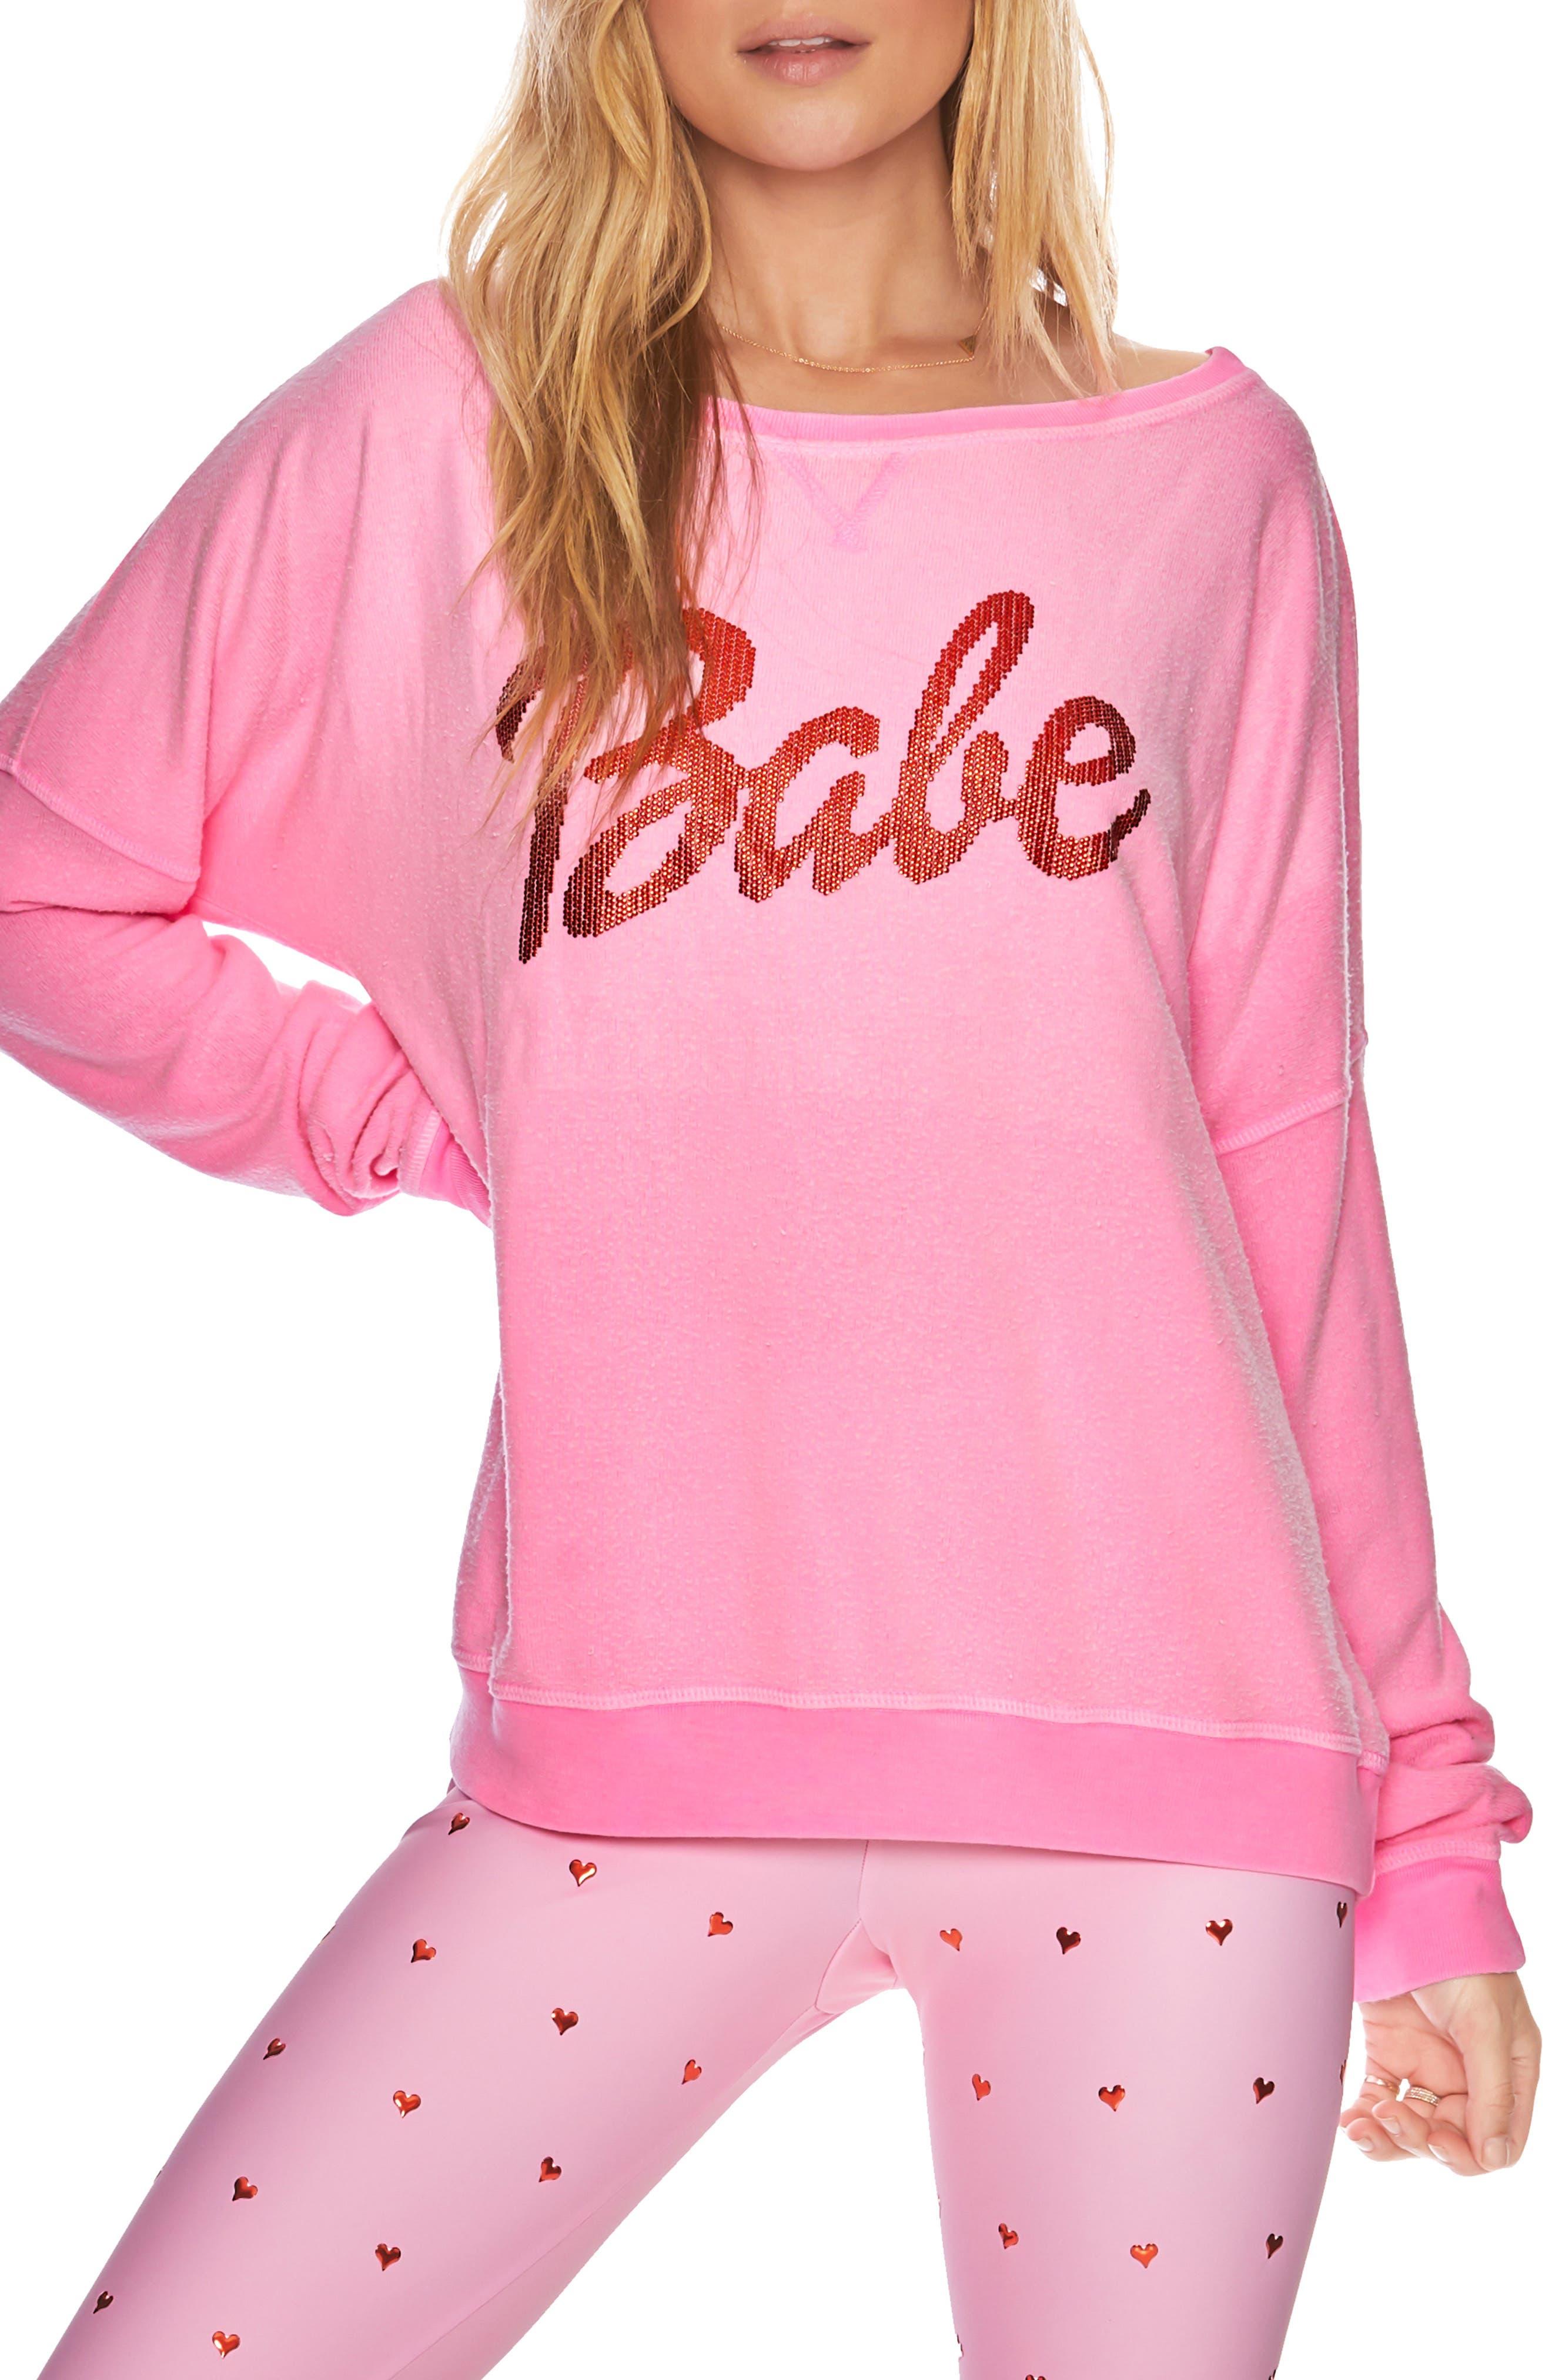 BEACH RIOT Babe Sweatshirt, Main, color, PINK